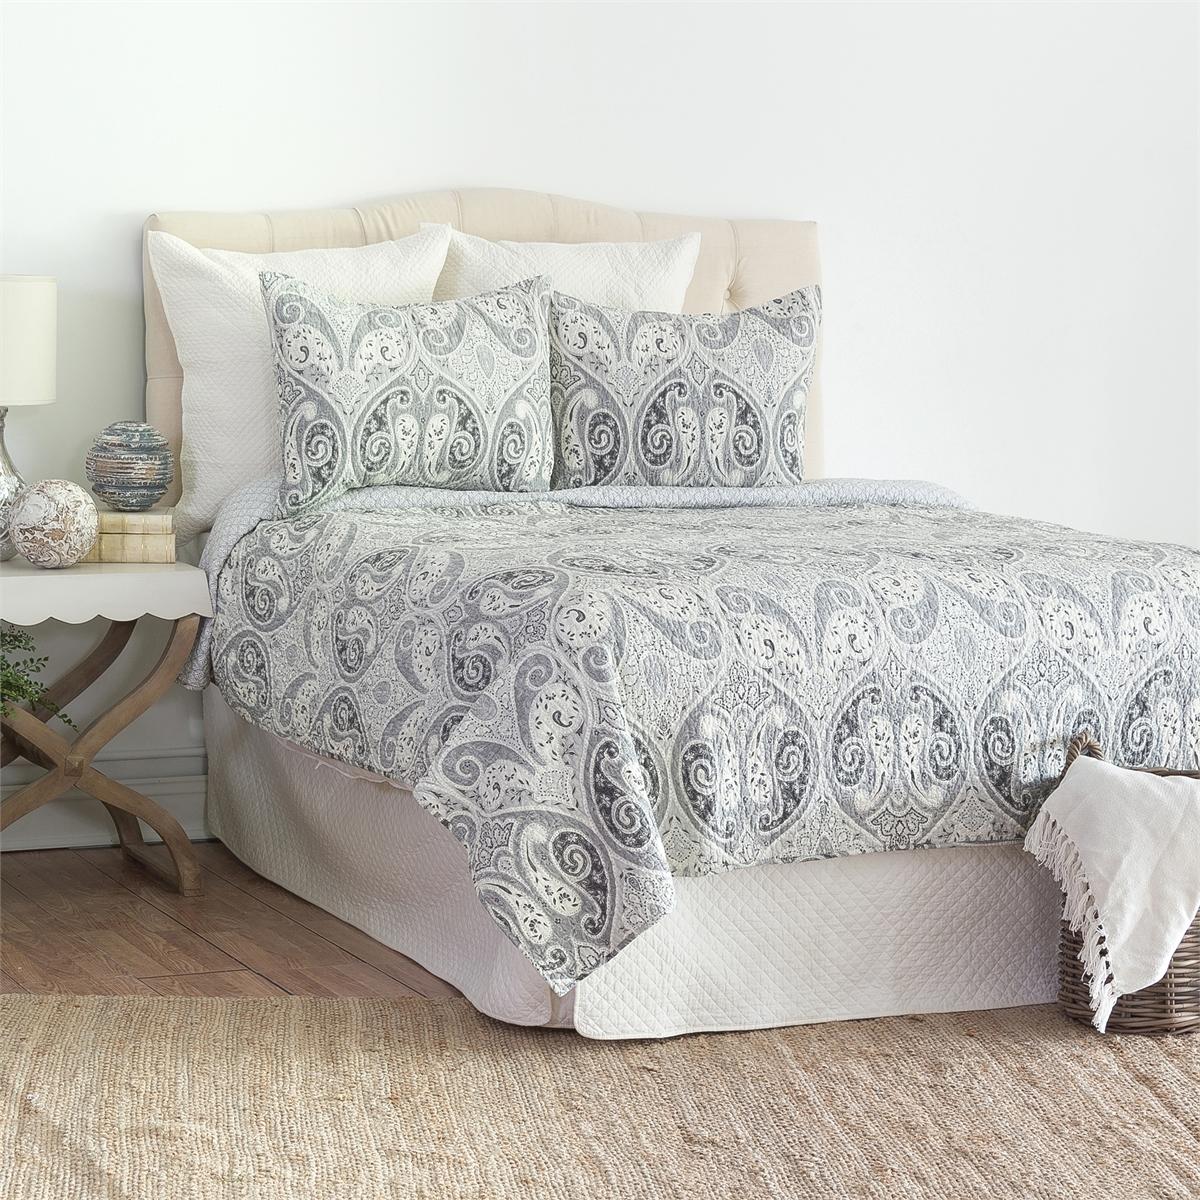 s bed bedding birch bath set ruffled reviews quilt wavy pdp gray lane